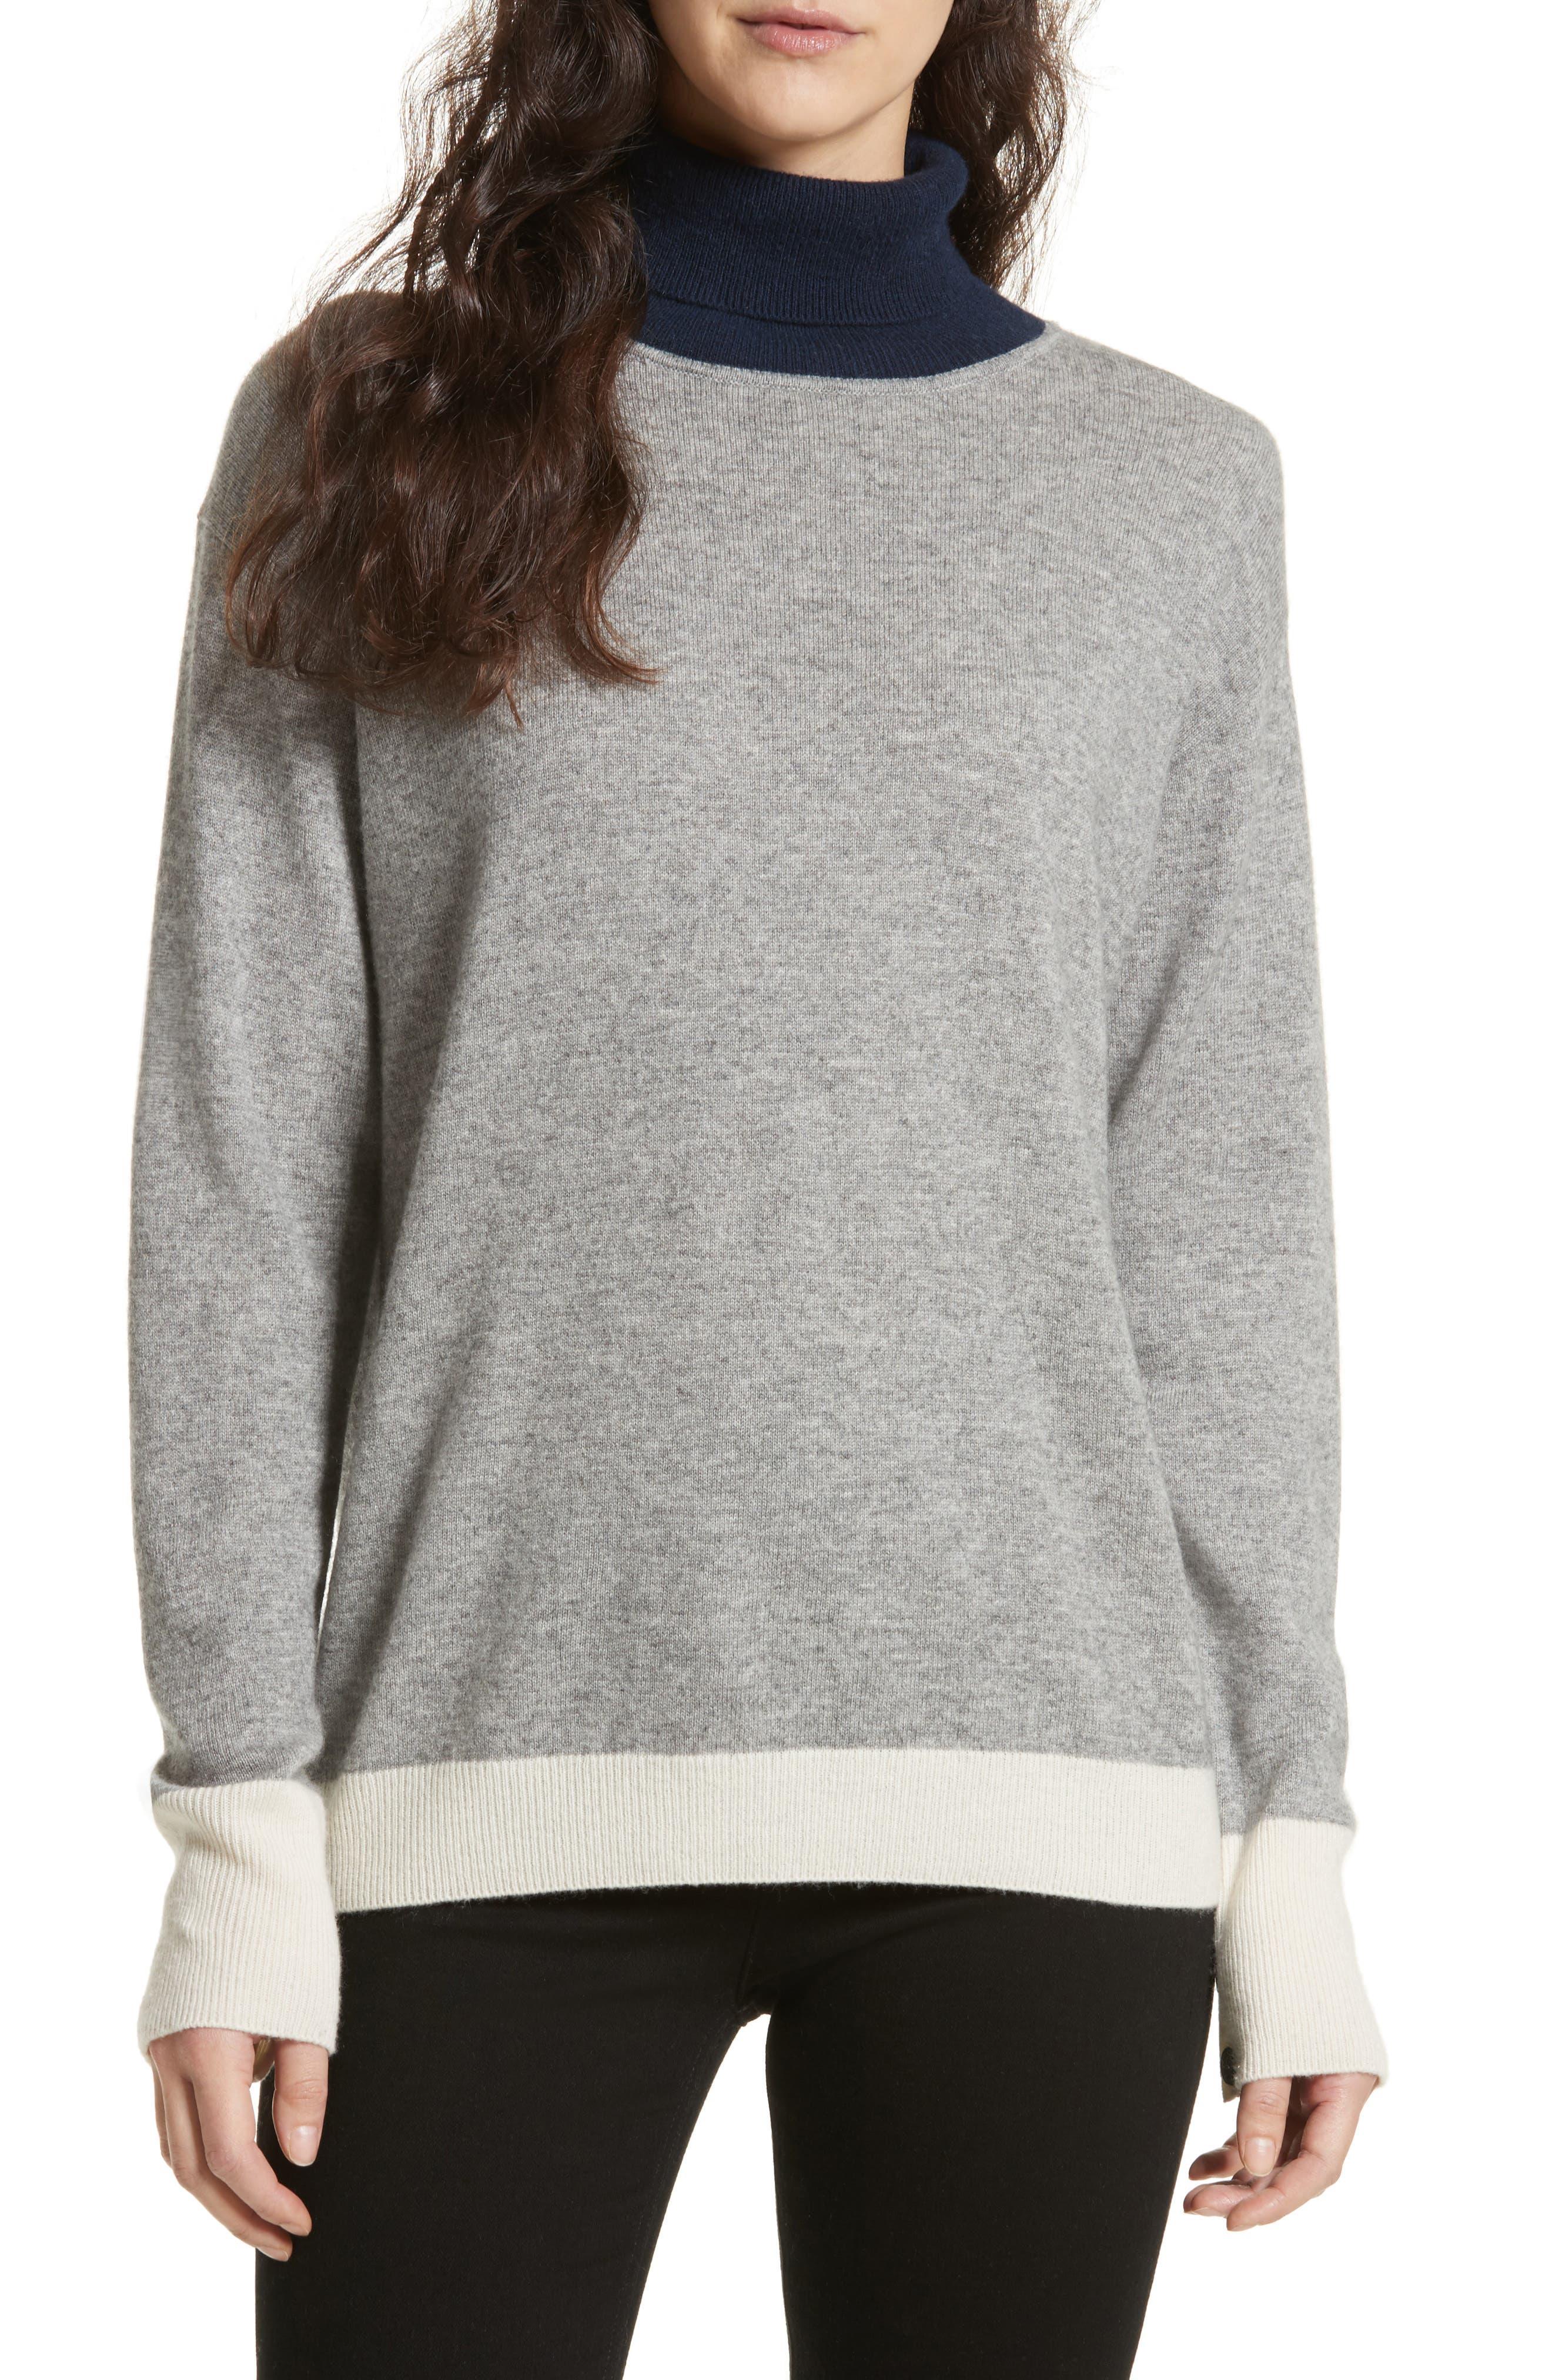 Rhea Wool & Cashmere Turtleneck Sweater,                             Main thumbnail 1, color,                             034